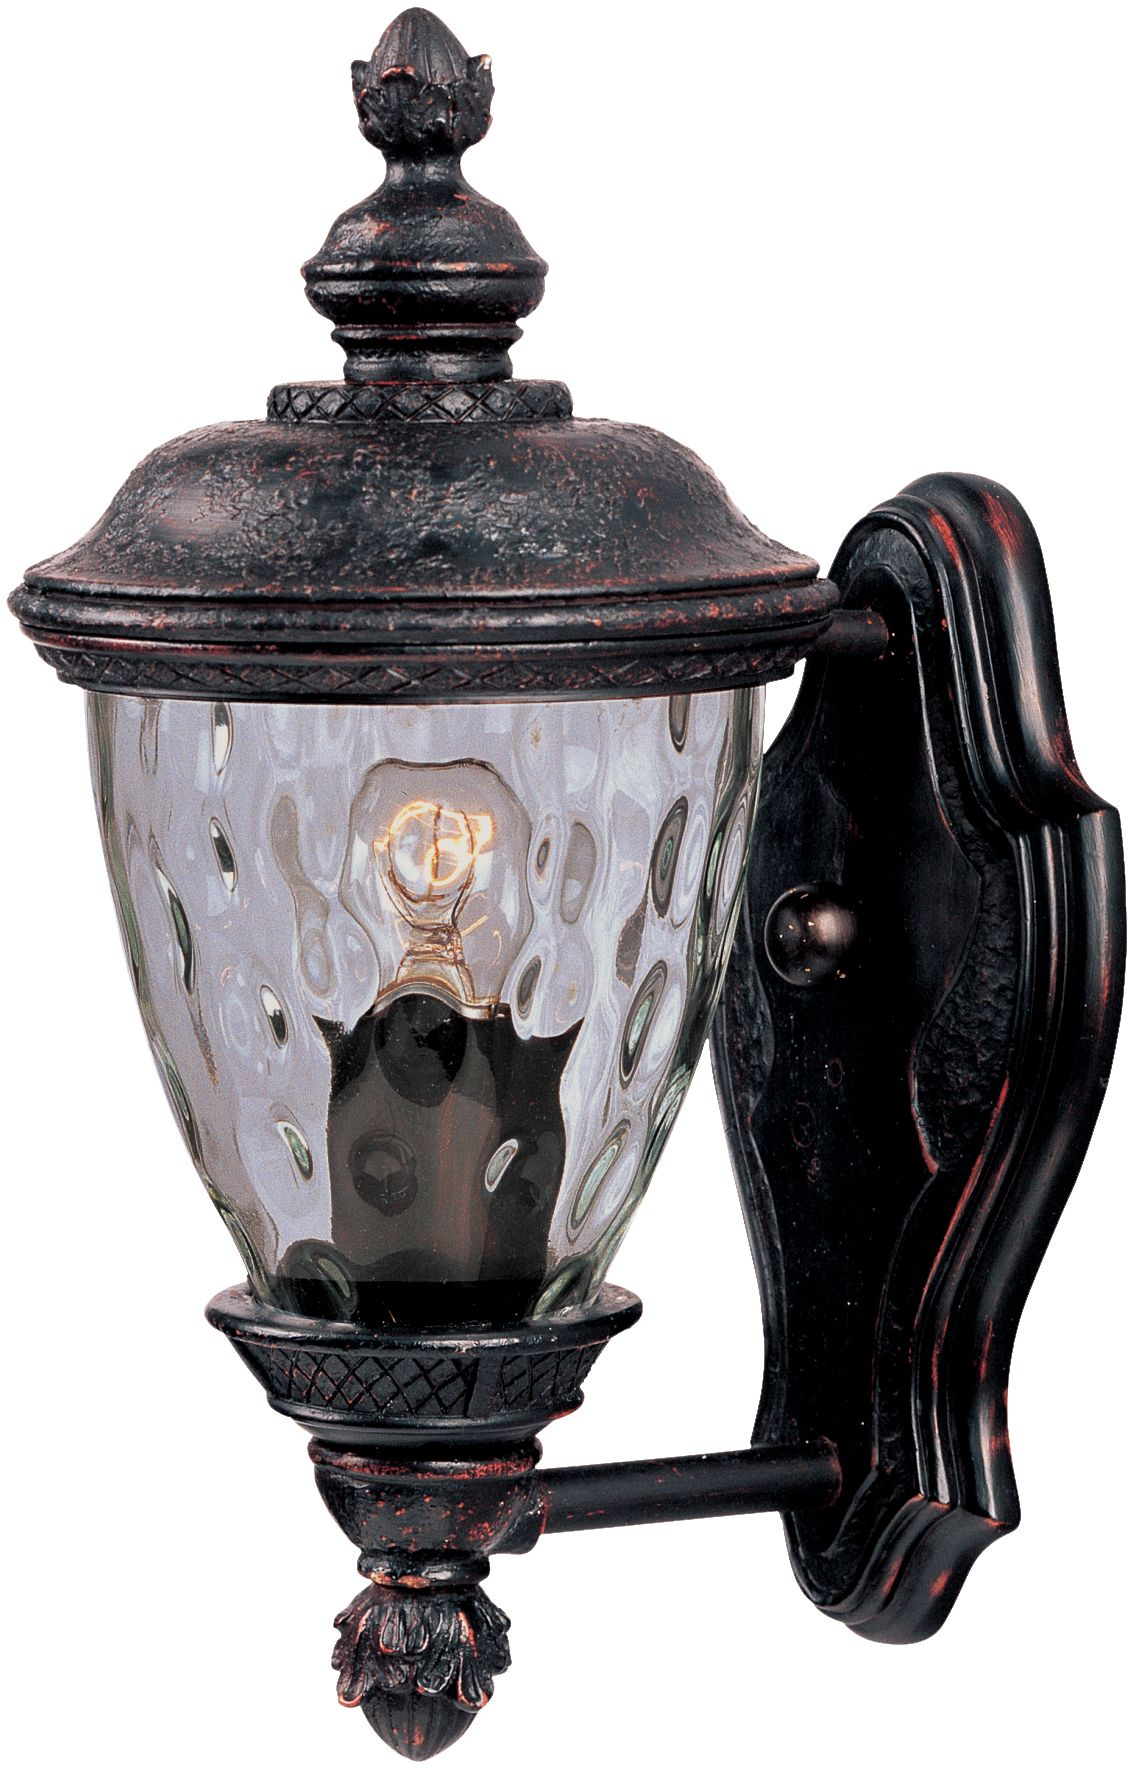 #One#Light#Oriental#Bronze#Water#Glass #Wall#Lantern http://lightingzoo.com/brand-maxim/one-light-oriental-bronze-water-glass-glass-wall-lantern/3495wgob/sku-DNC4